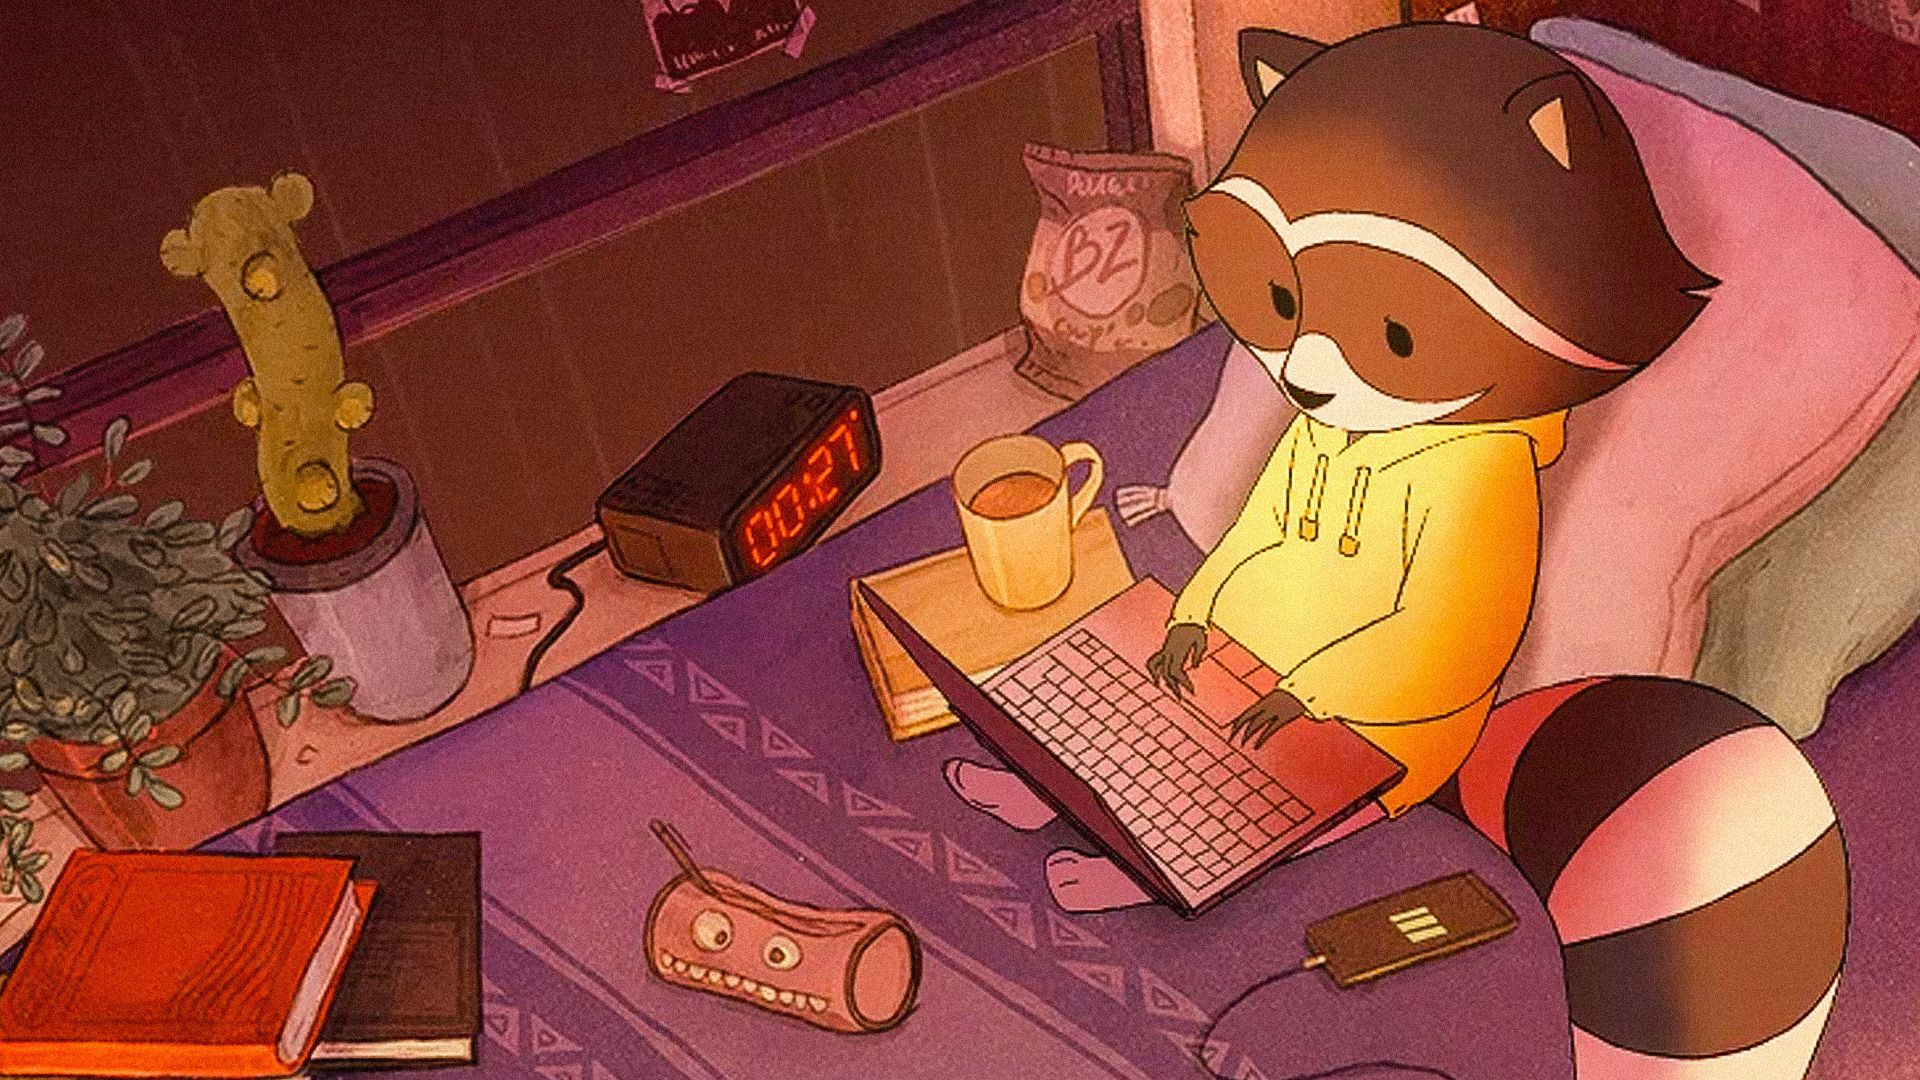 24 Hours A Day The Best Chillest Jazzy Lofi Hip Hop Tracks Hip Hop Radio Cartoon Art Hip Hop Art